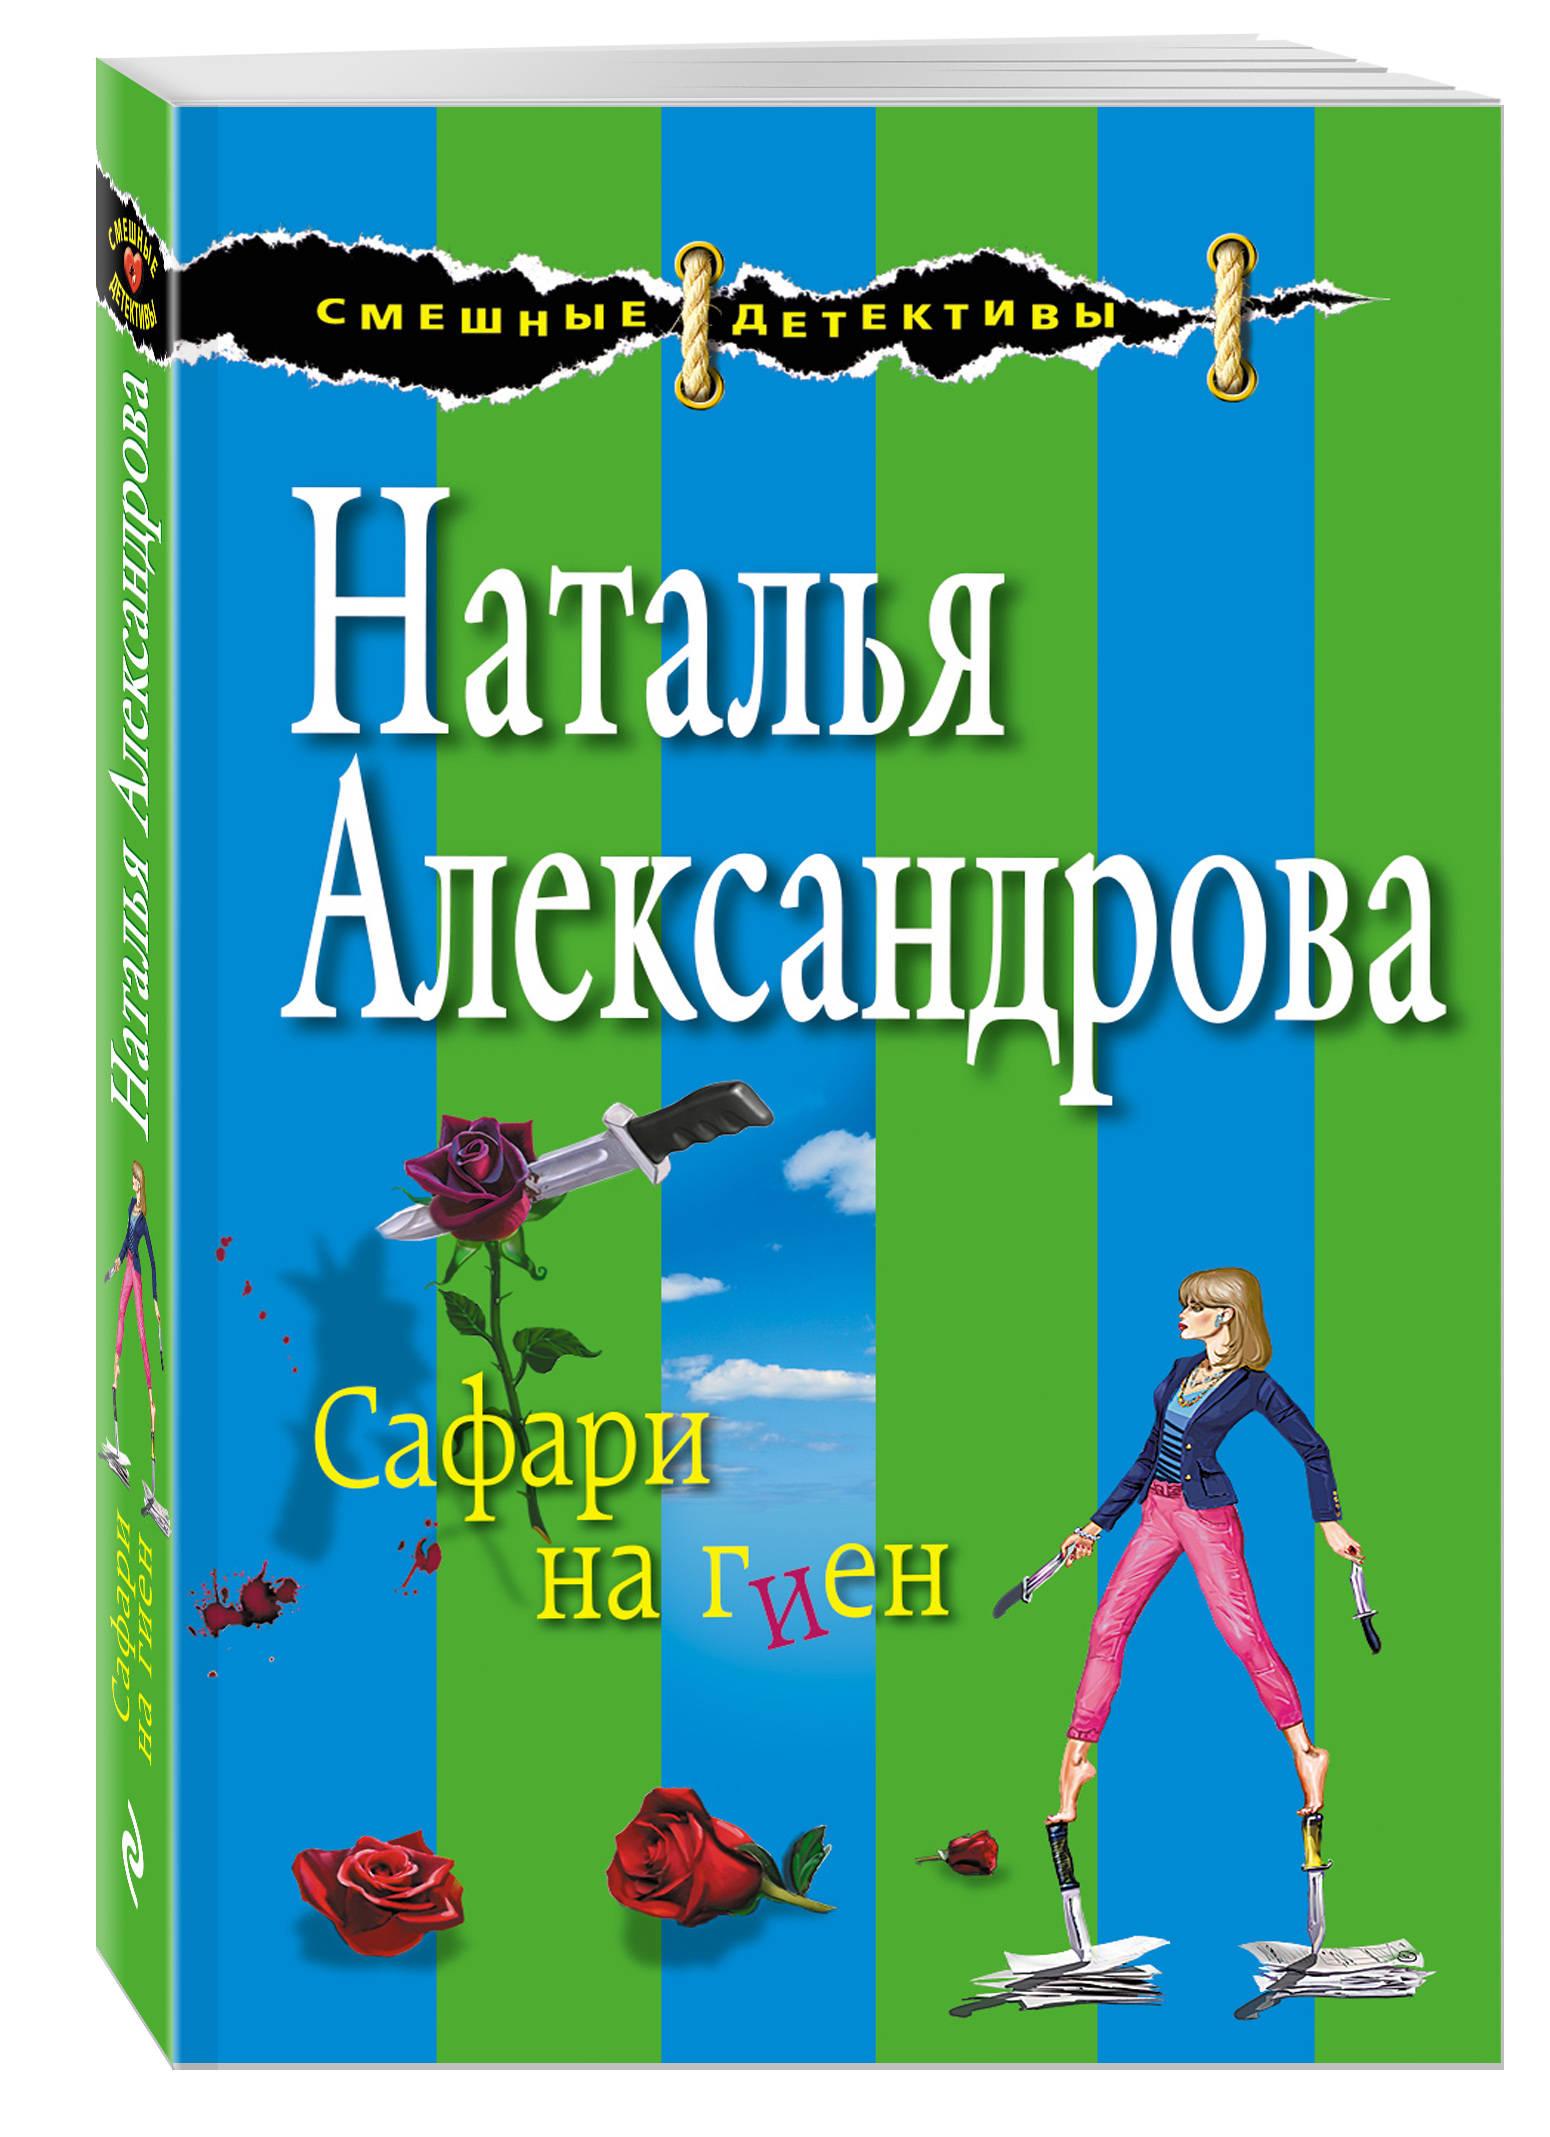 Александрова Н.Н. Сафари на гиен неизвестный друг